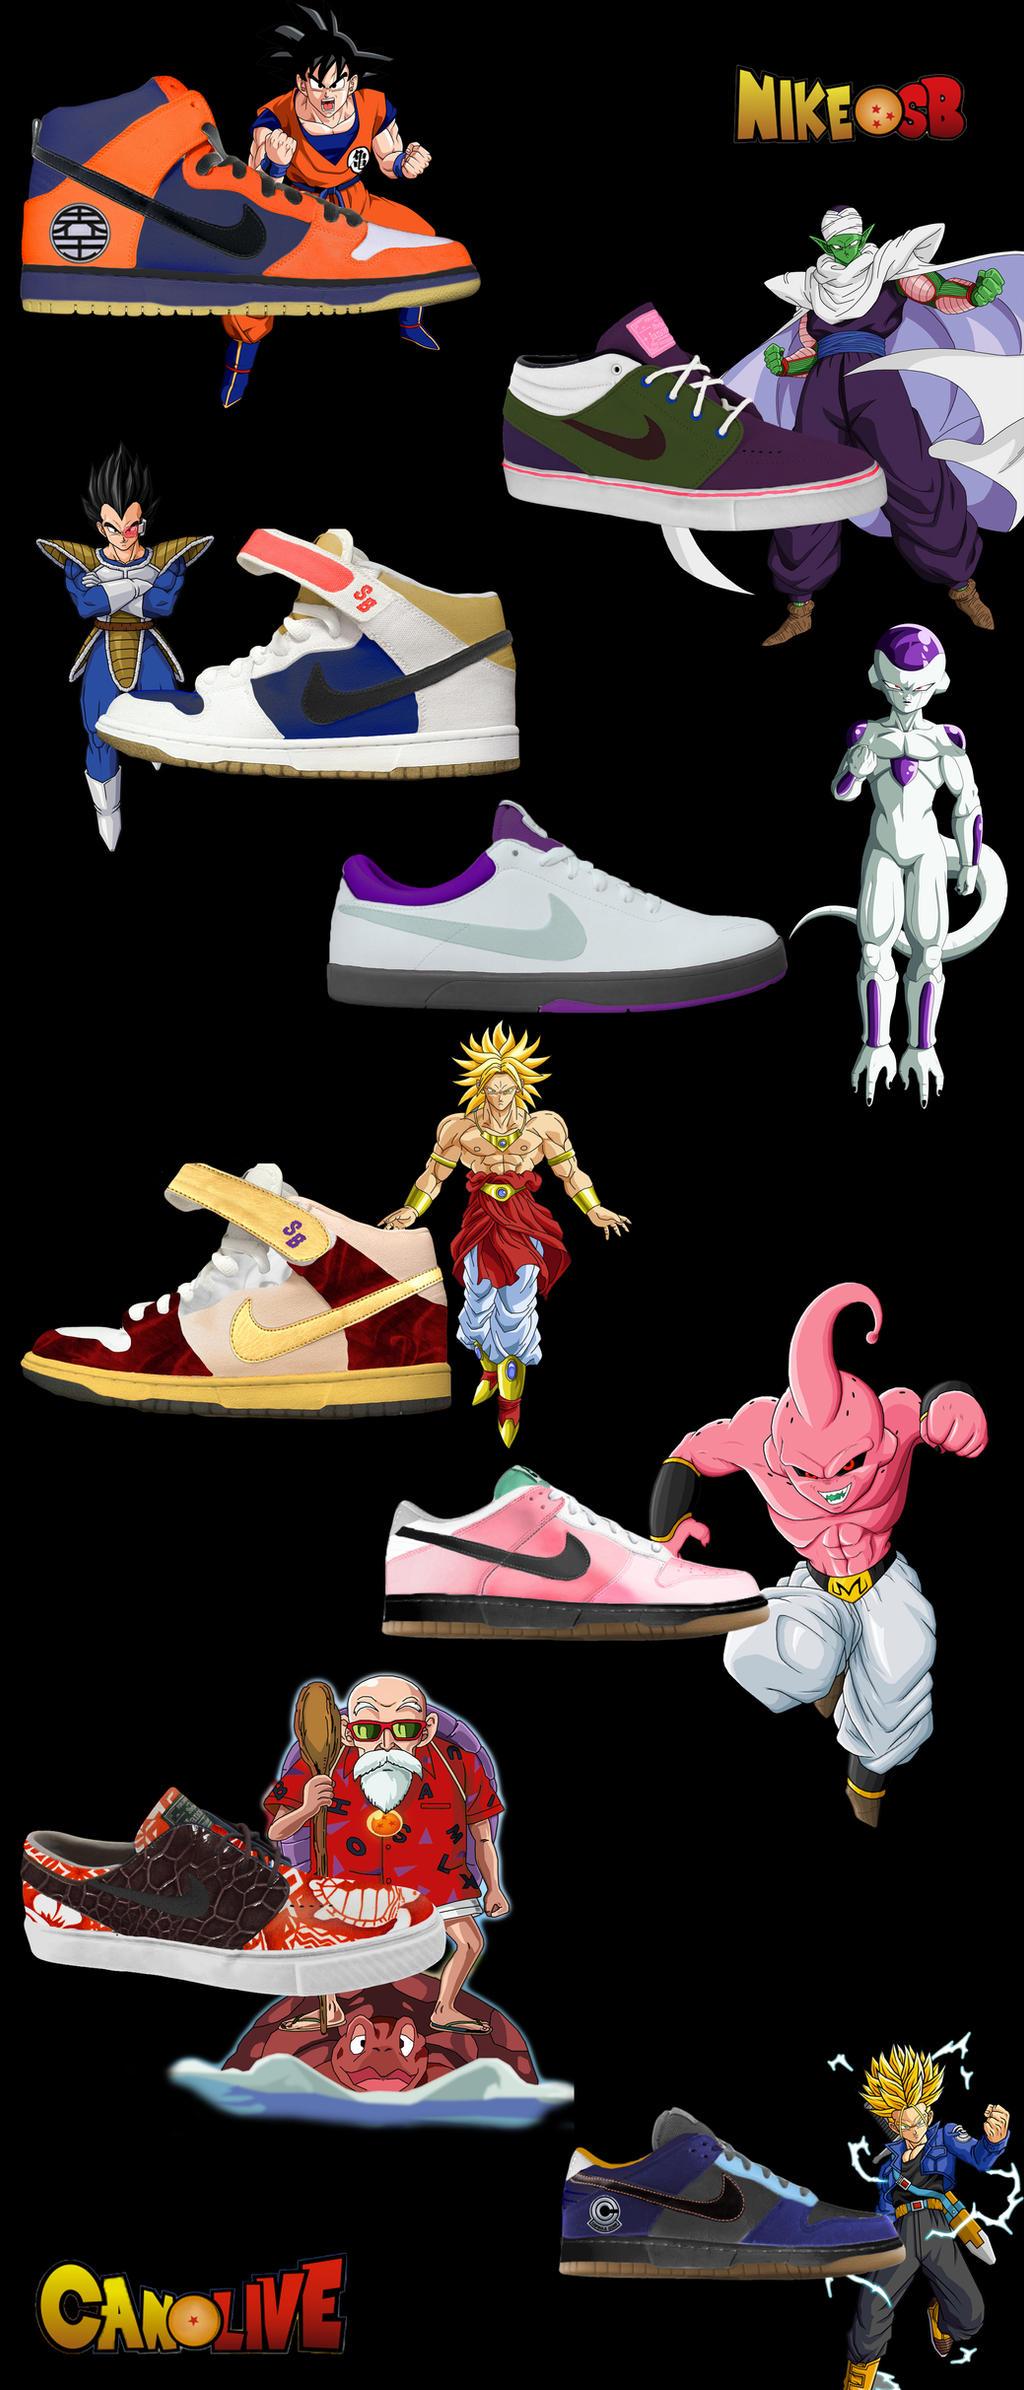 semestre Basura El uno al otro  DragonBall Z Custom Nike SB Footwear by Can1Live on DeviantArt